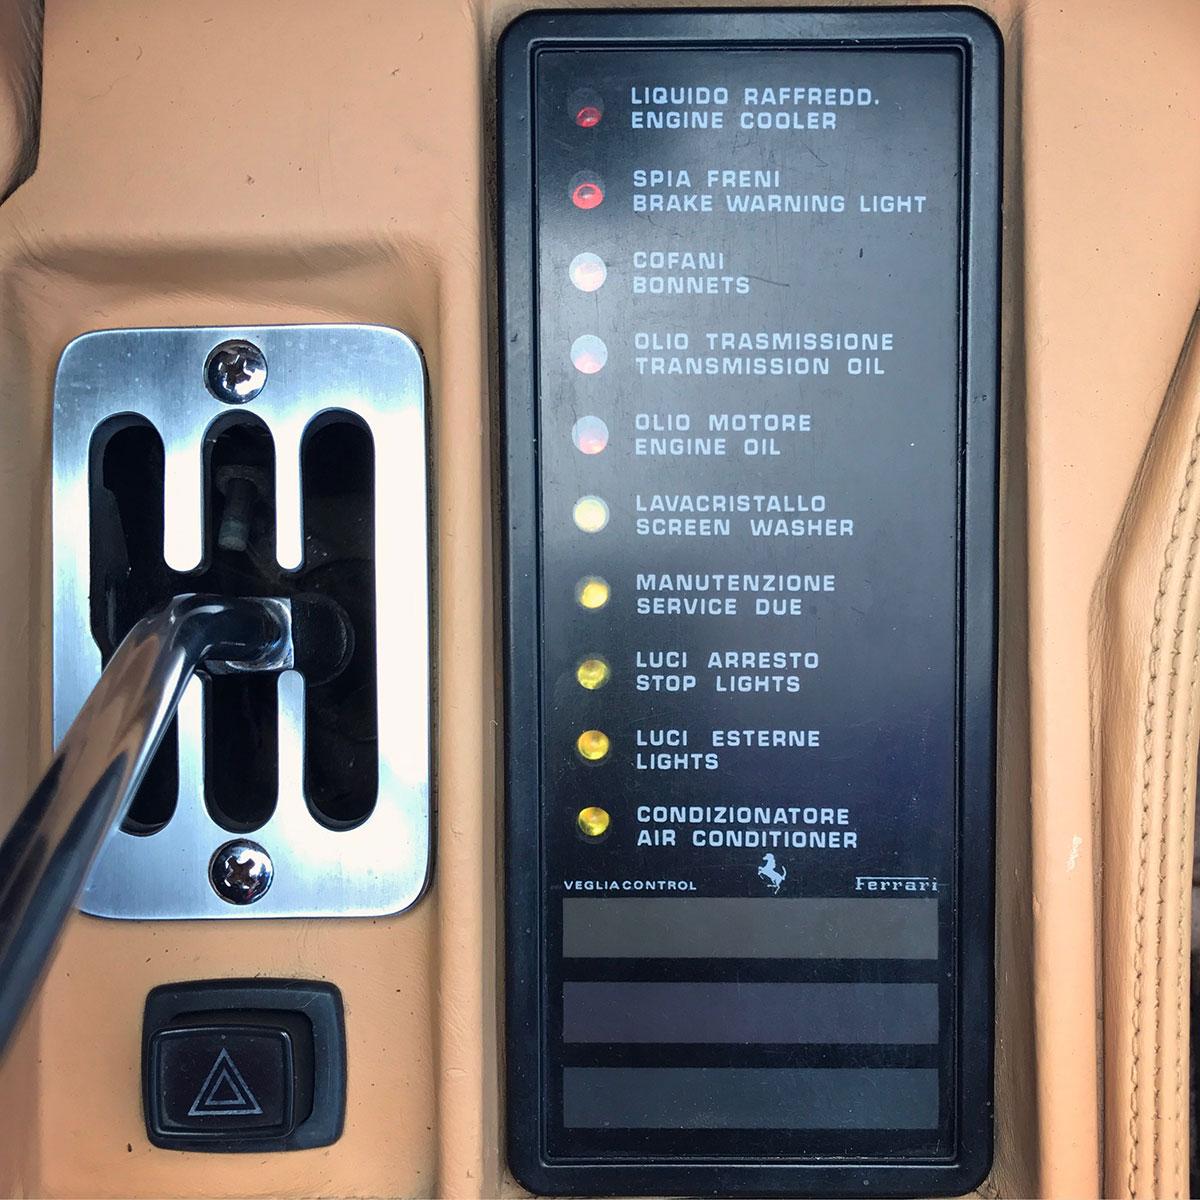 ferrari-mondial-status-panel-and-gated-shifter-interior.jpg